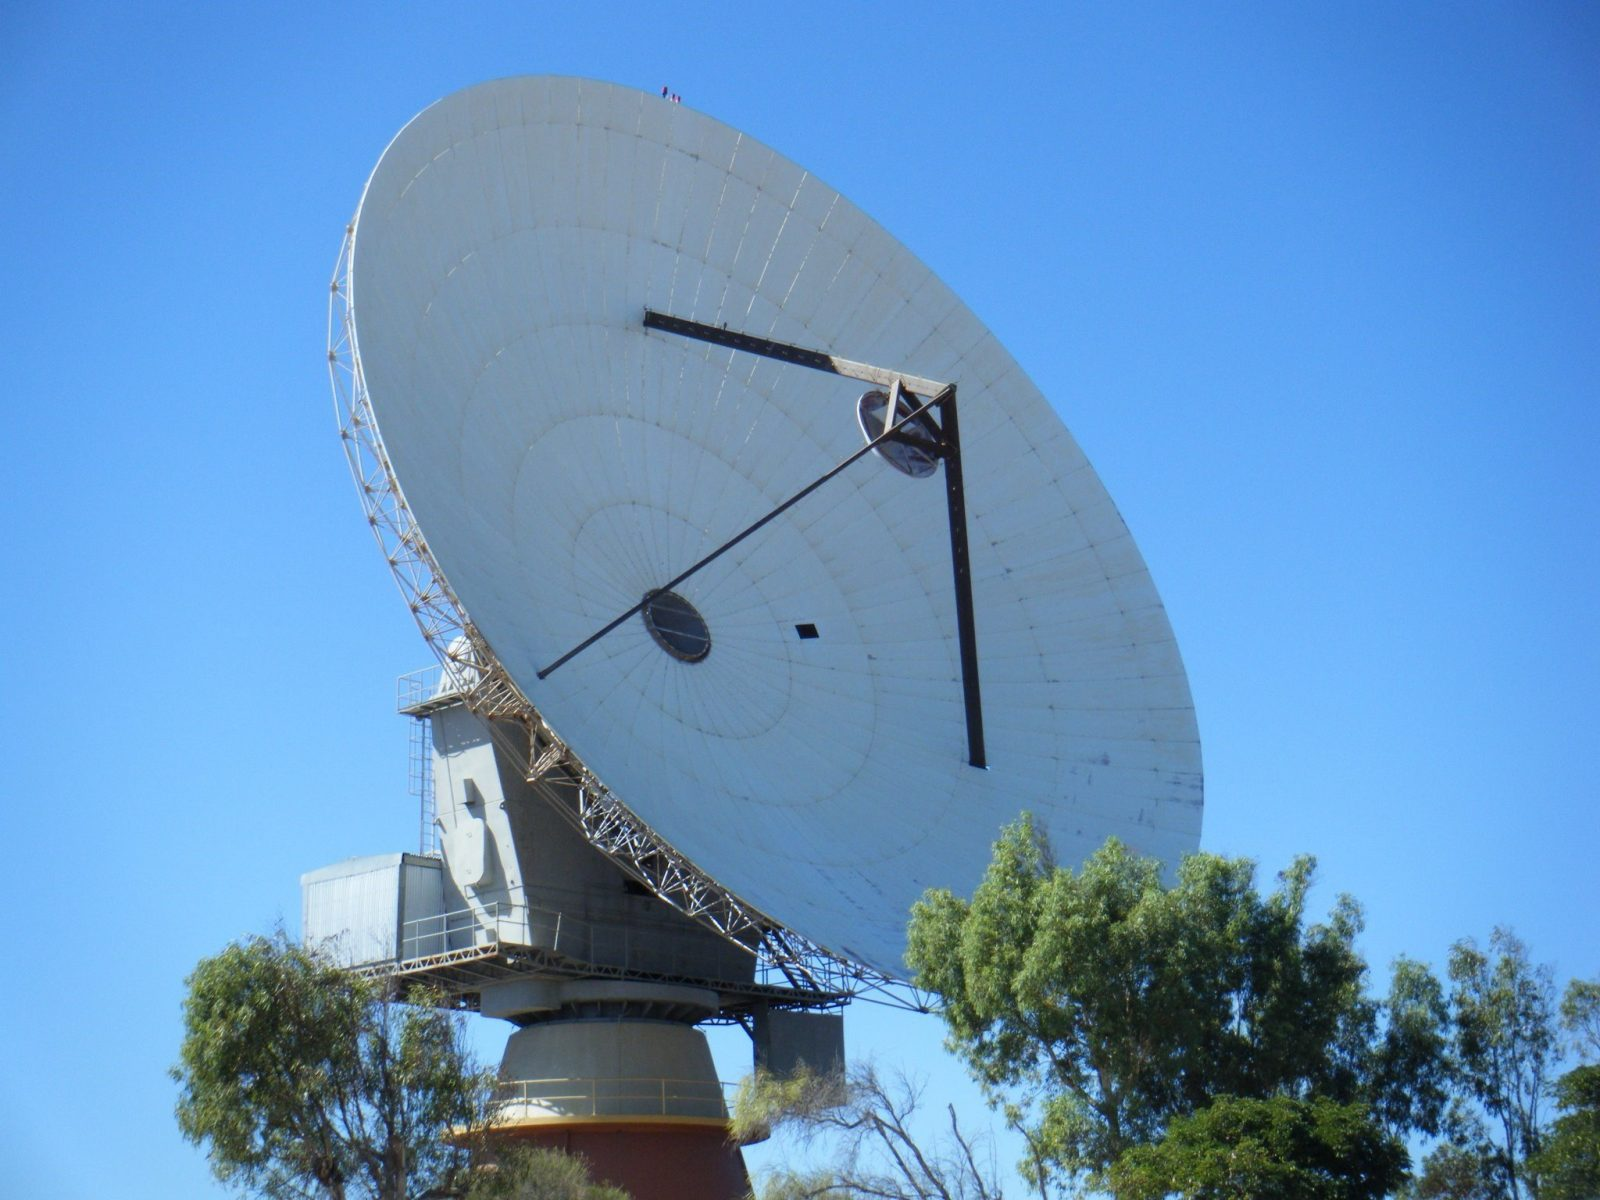 Carnarvon Space and Technology Museum, Browns Range, Western Australia